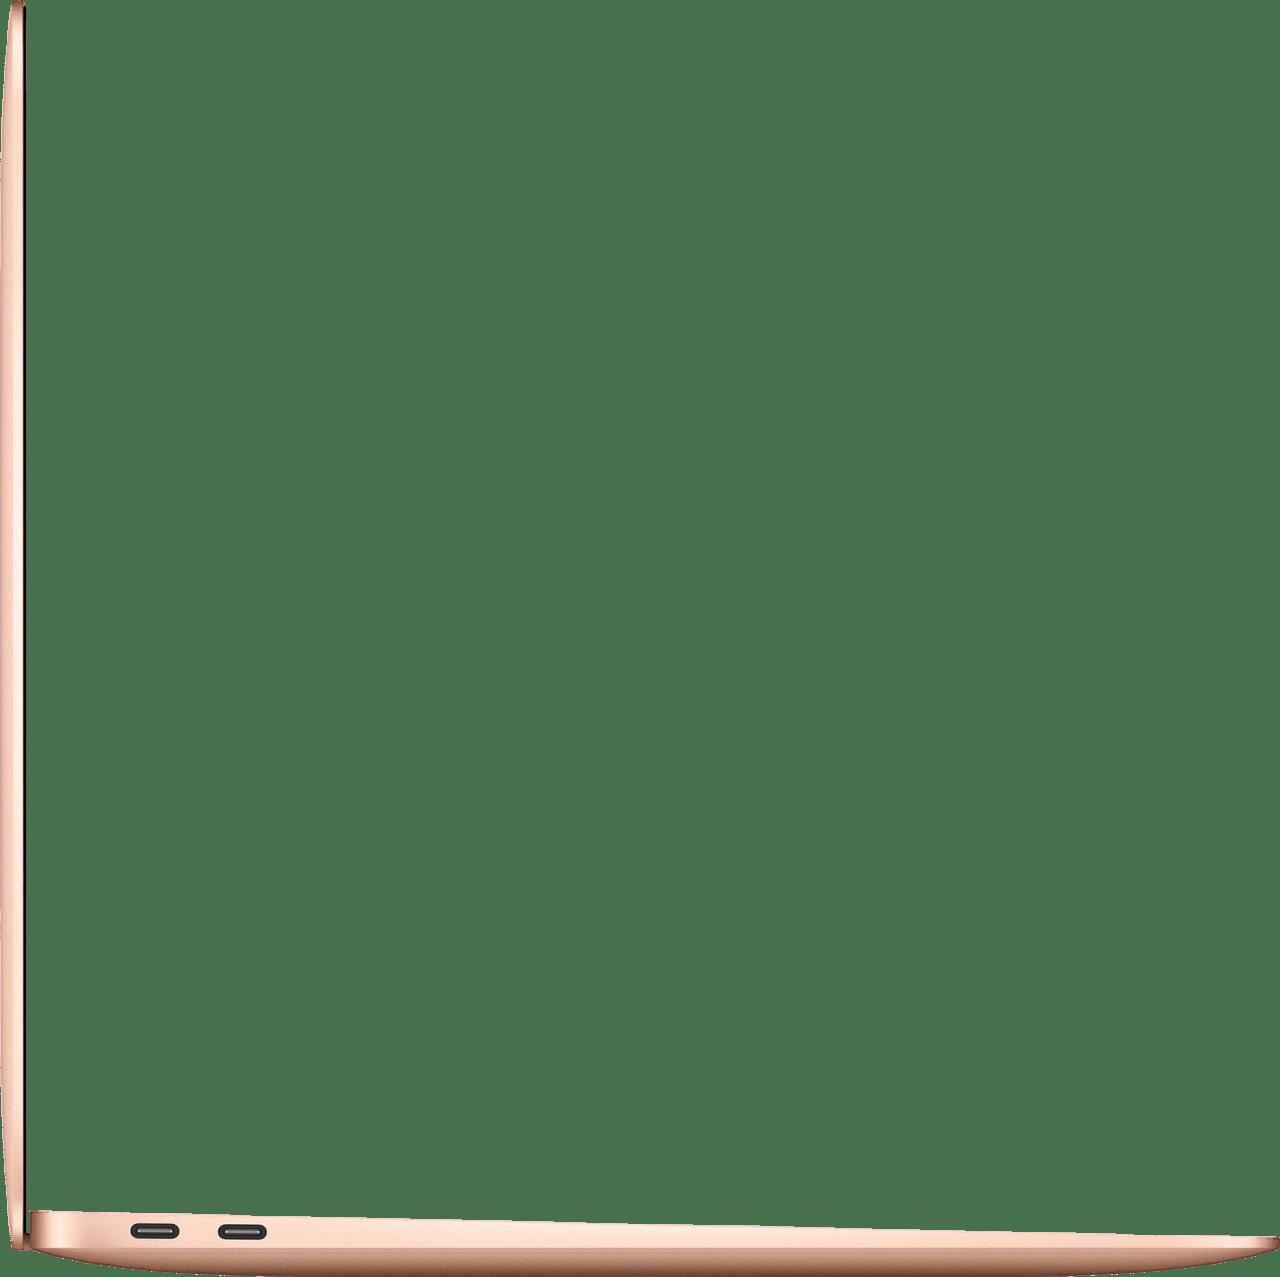 Gold Apple MacBook Air (Late 2020) - Spanish (QWERTY) Laptop - Apple M1 - 8GB - 256GB SSD - Apple Integrated 7-core GPU.3